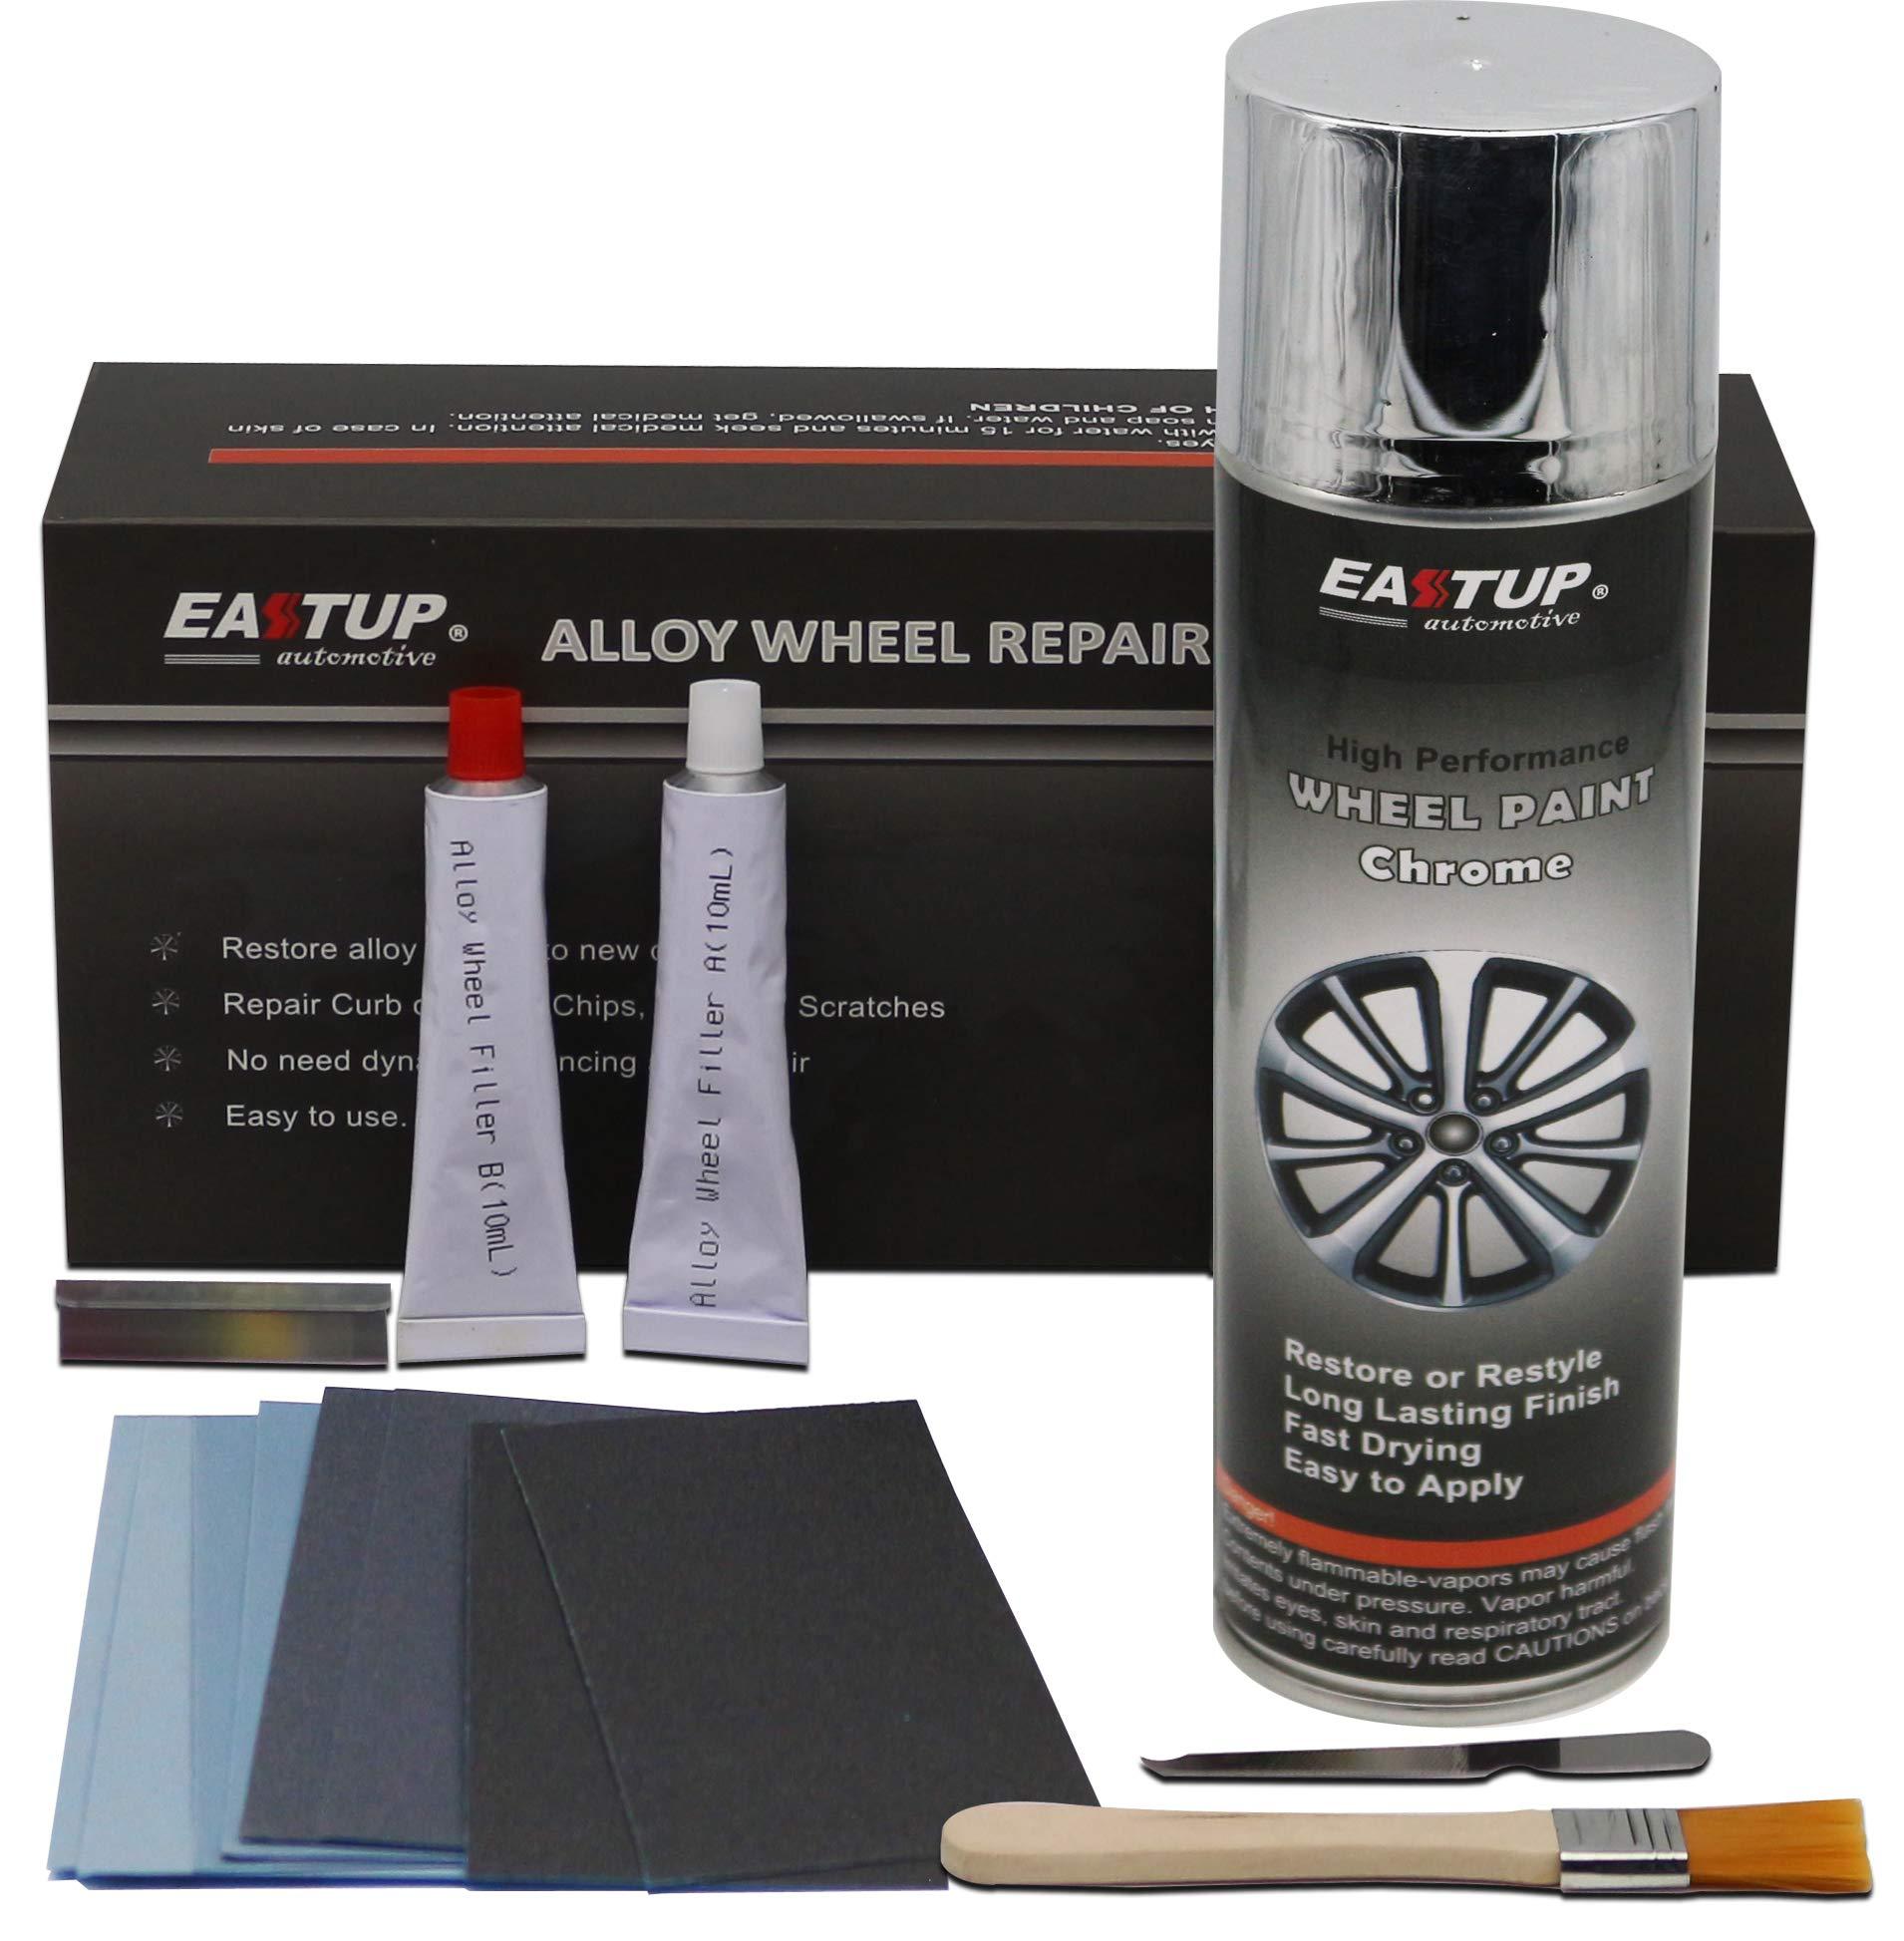 Eastup 80005 Alloy Wheel Repair Kit for Chrome Color Wheels